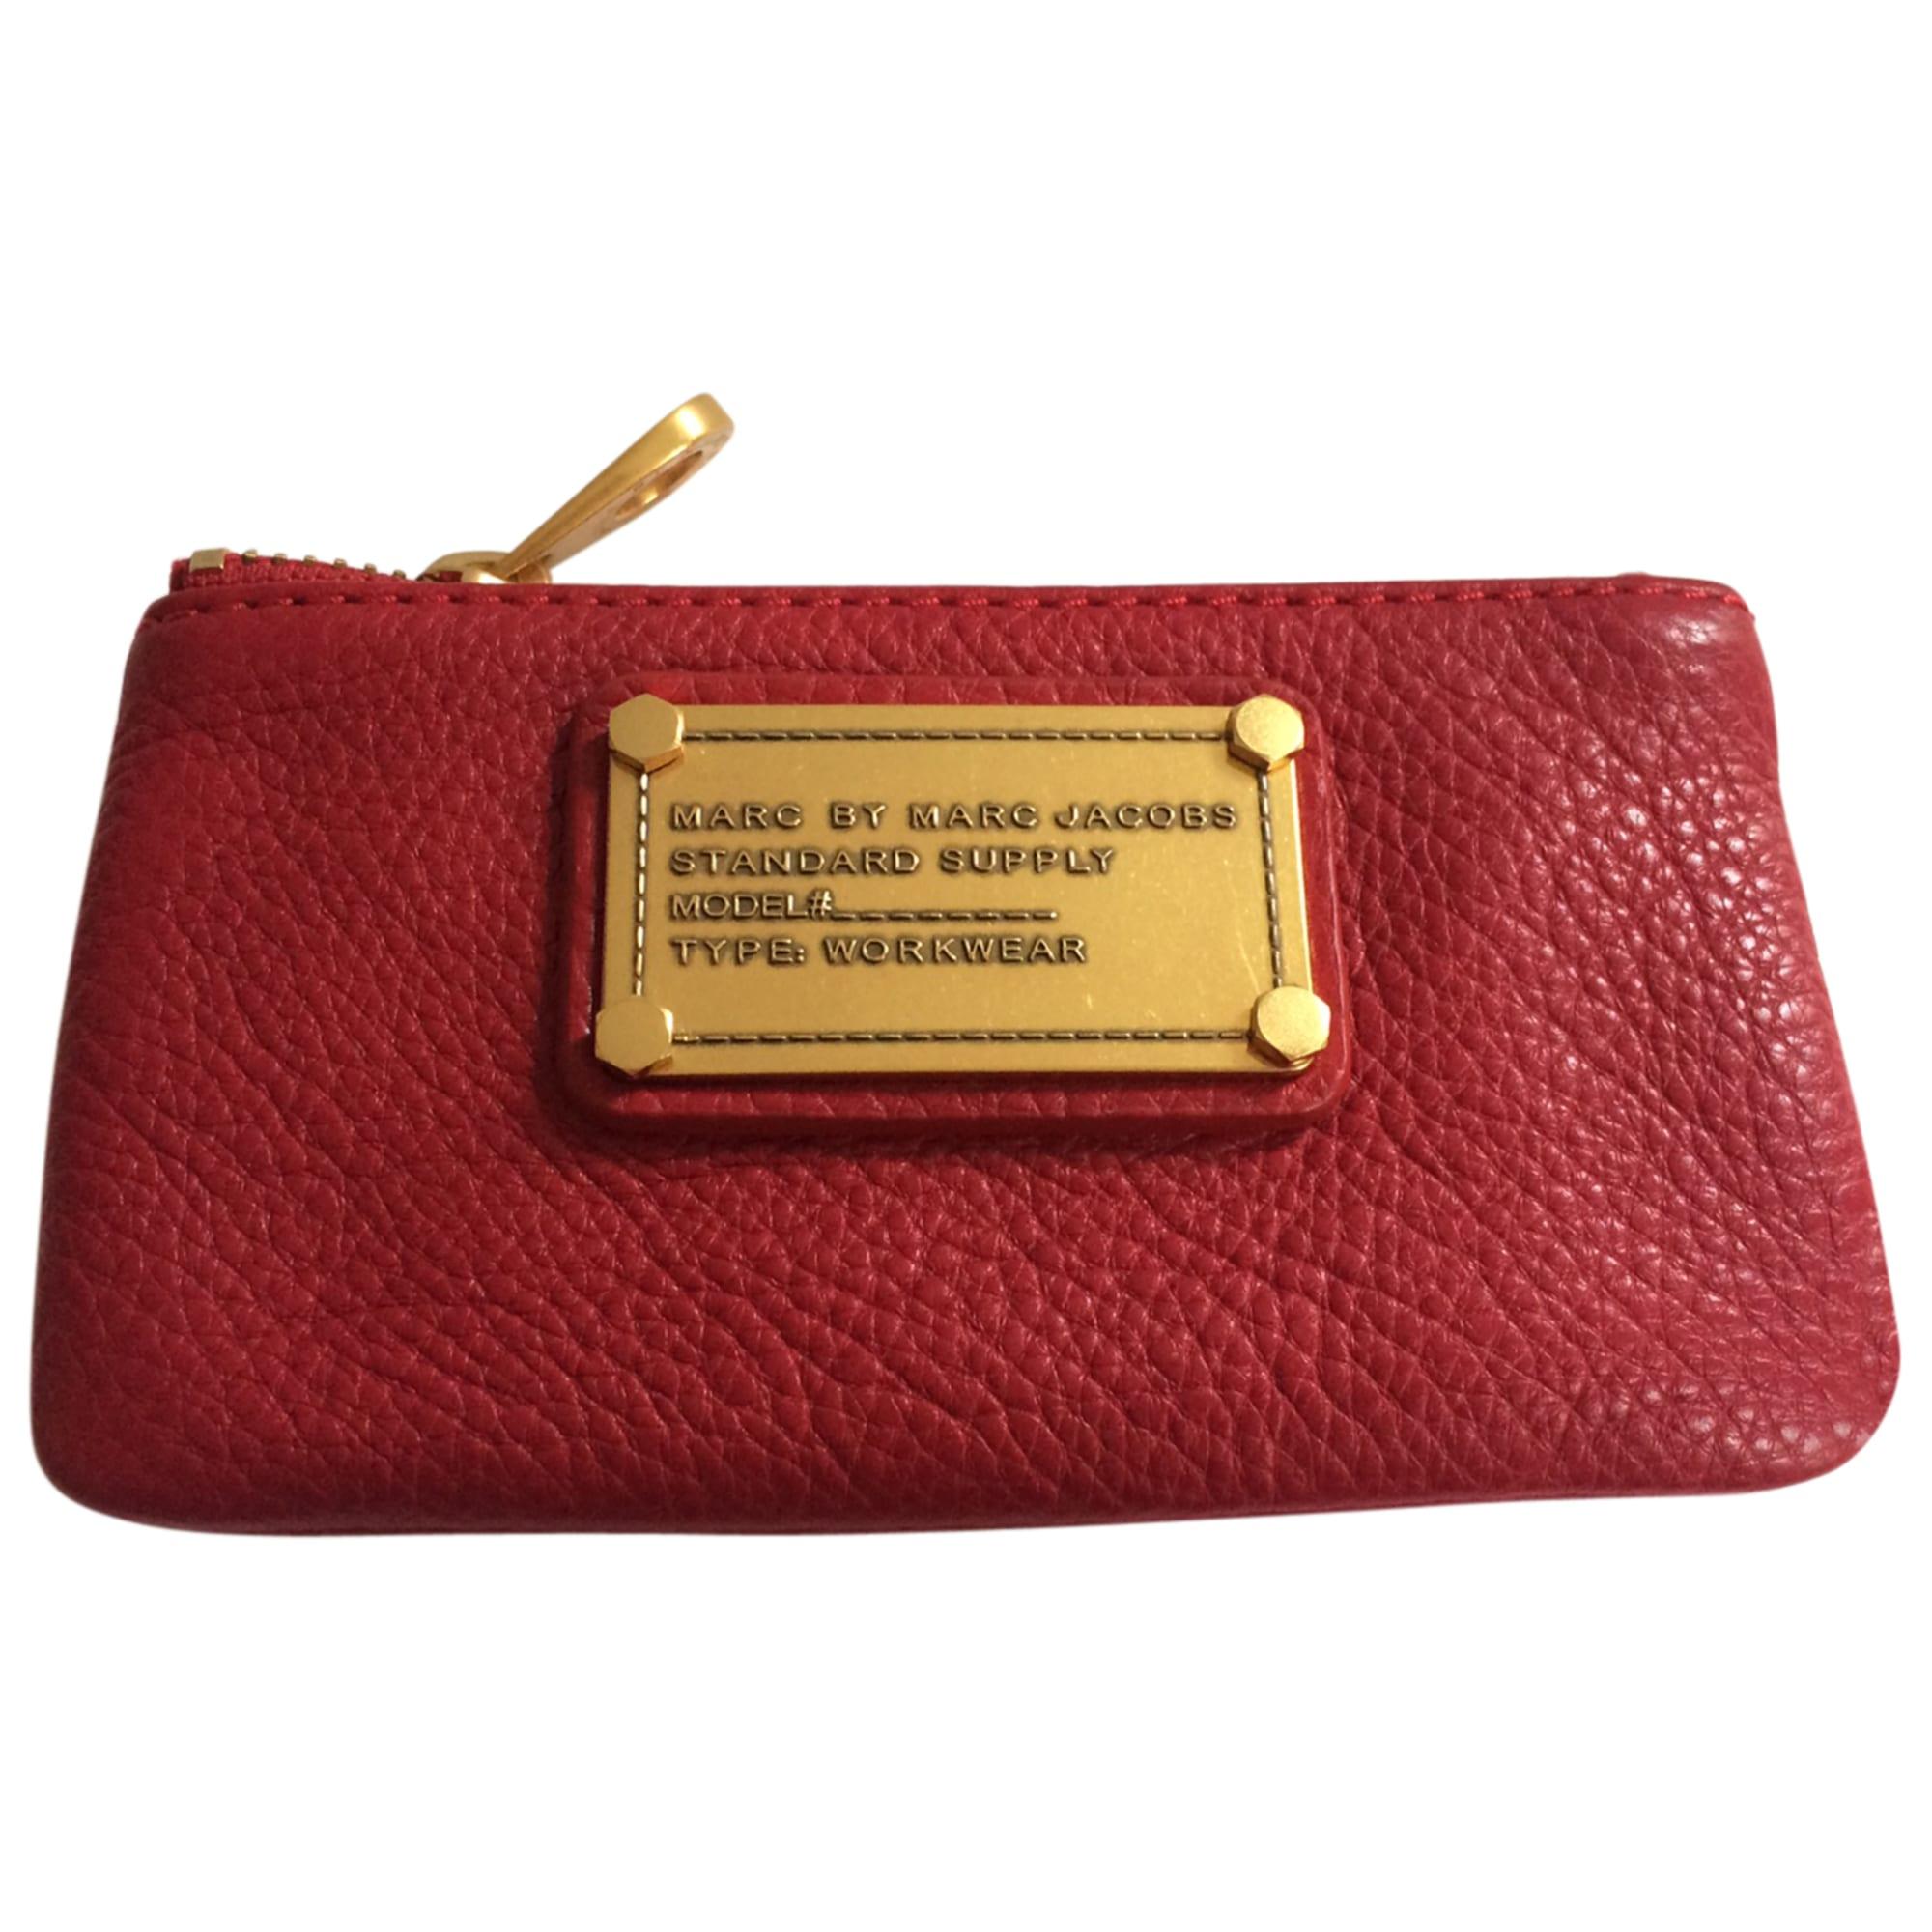 Schlüsseletui MARC JACOBS rot vendu par Mirabelle1 - 4079589